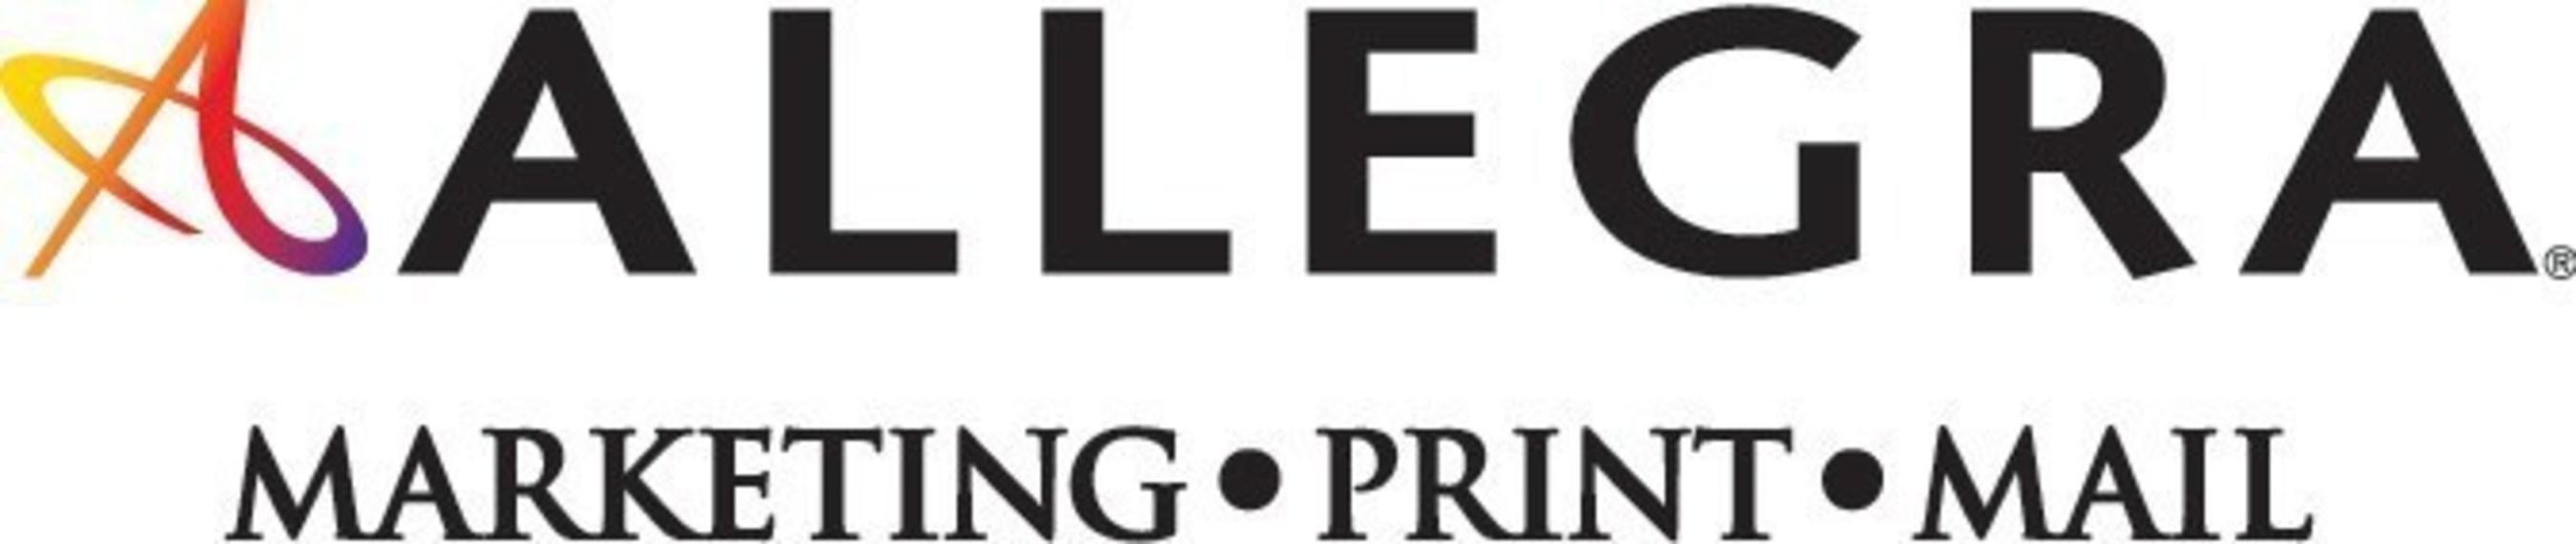 Allegra Marketing, Print, Mail Logo